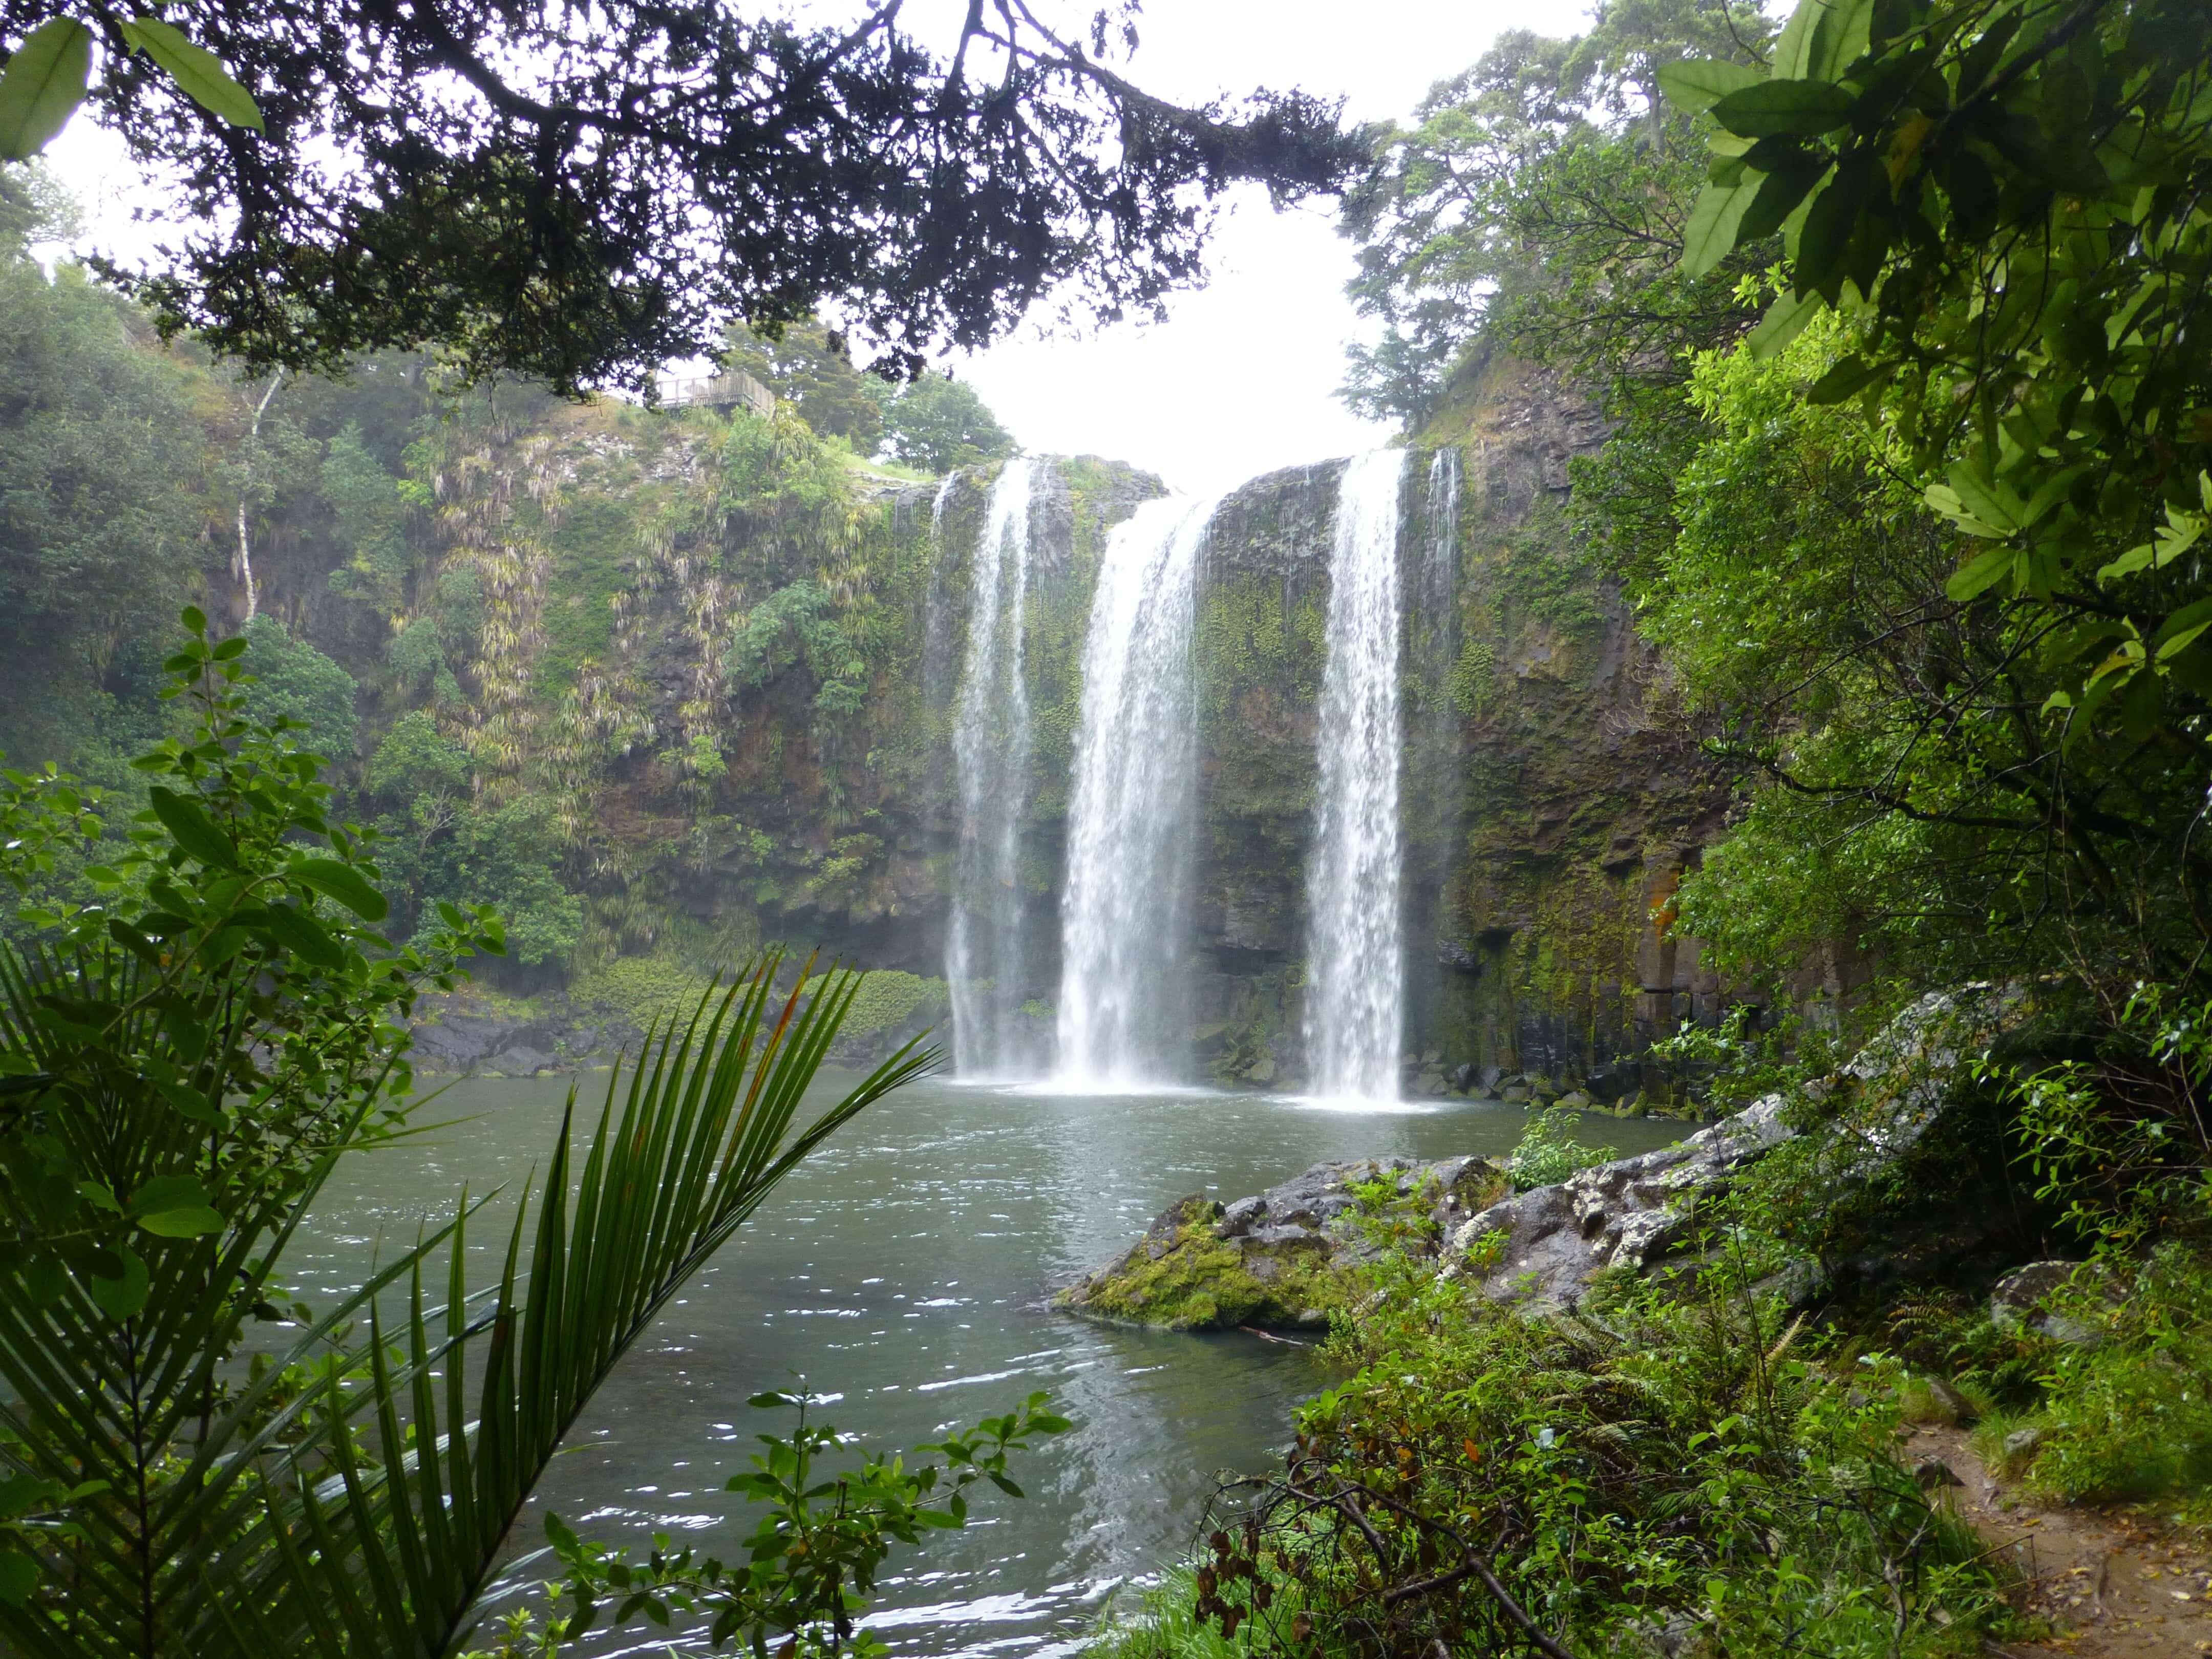 Weit weg Reisen, Whangarei Falls, Neuseeland 5